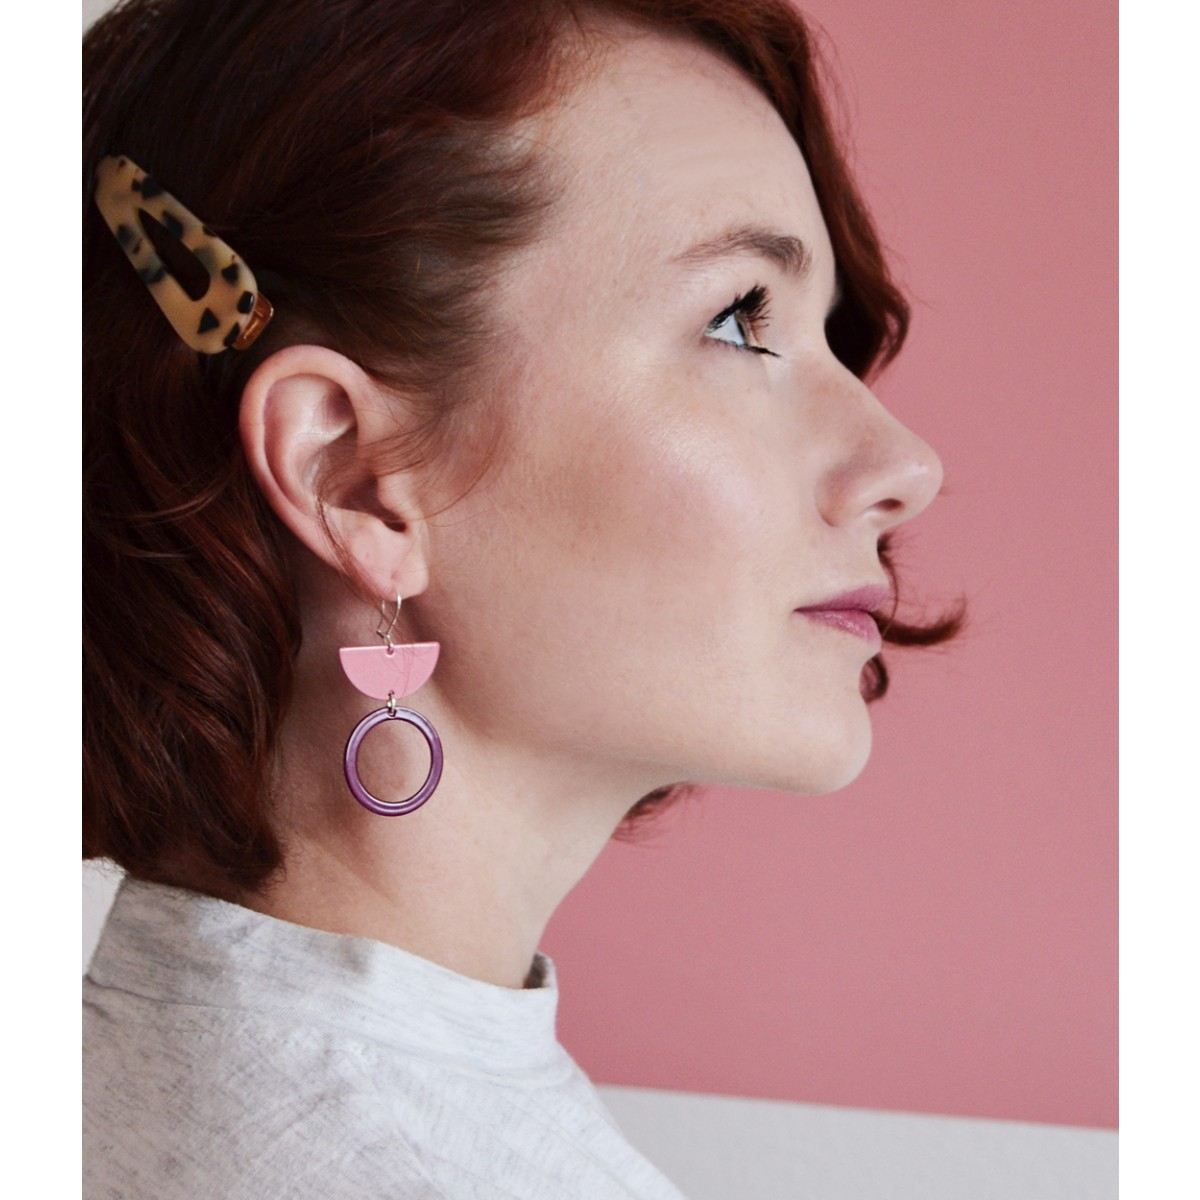 Nachhaltige Ohrringe: LU lila